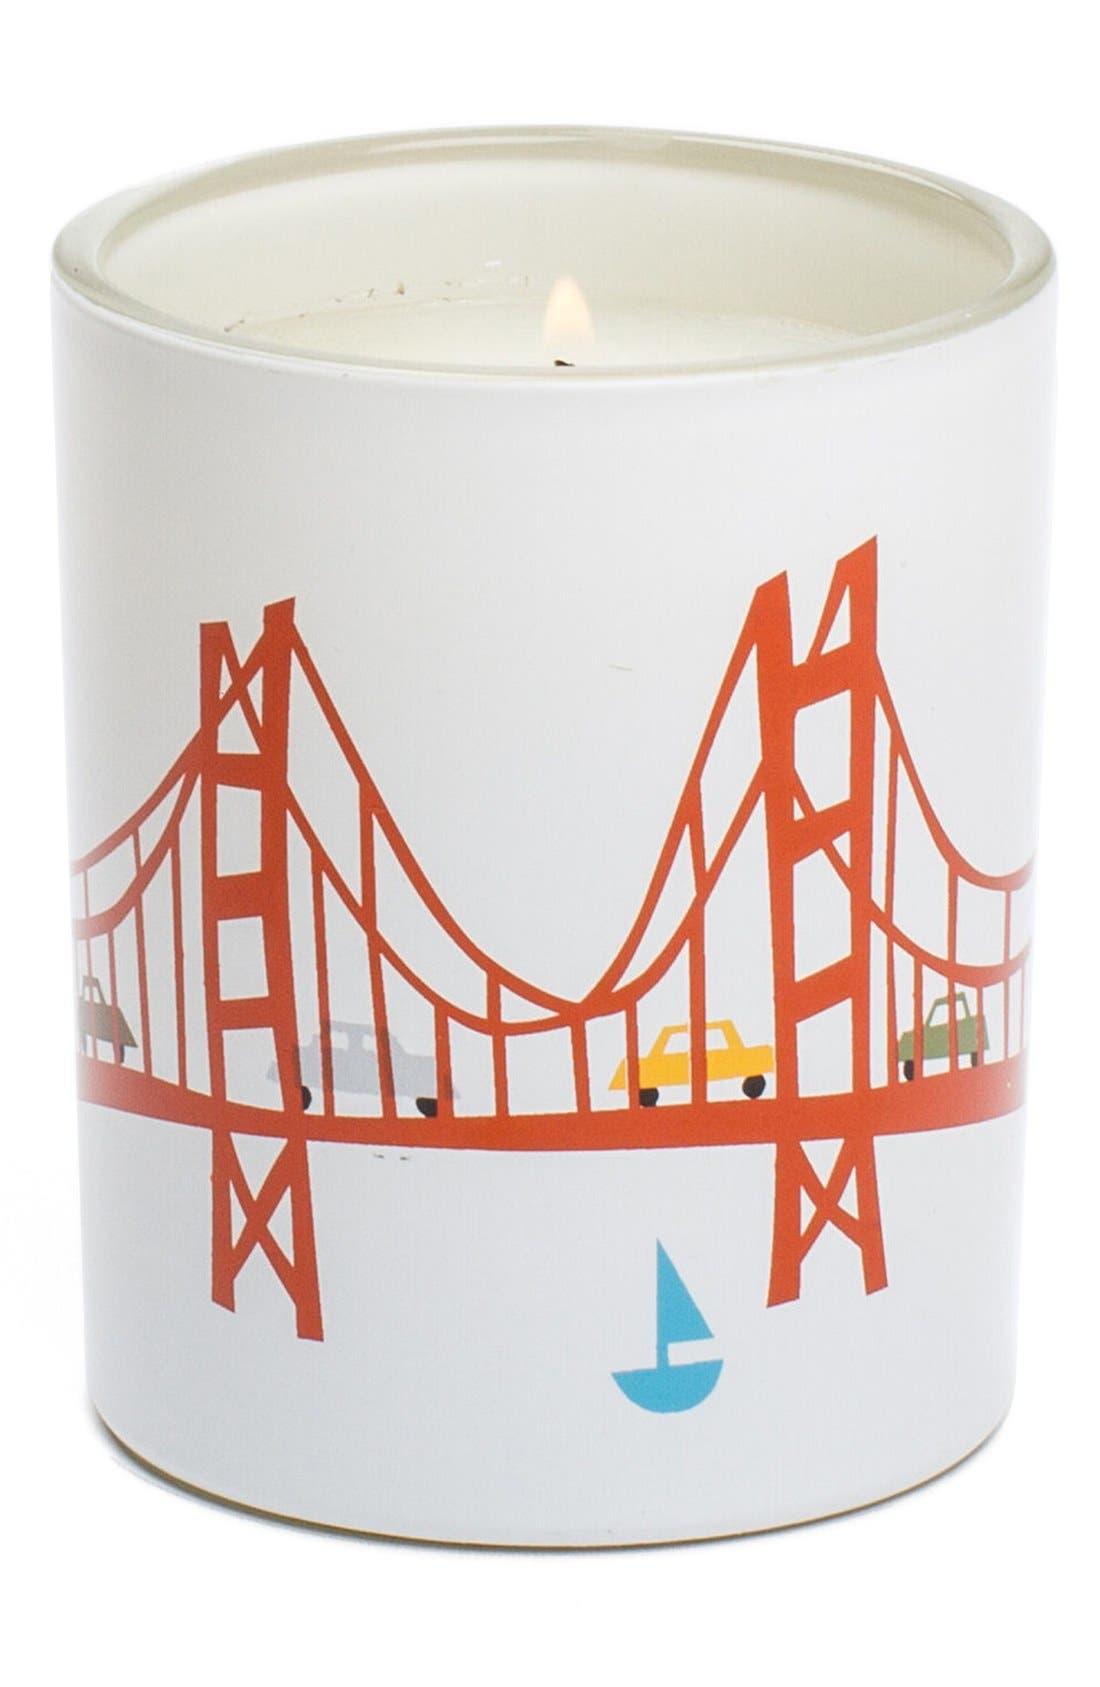 R. NICHOLS 'Coast' Scented Candle